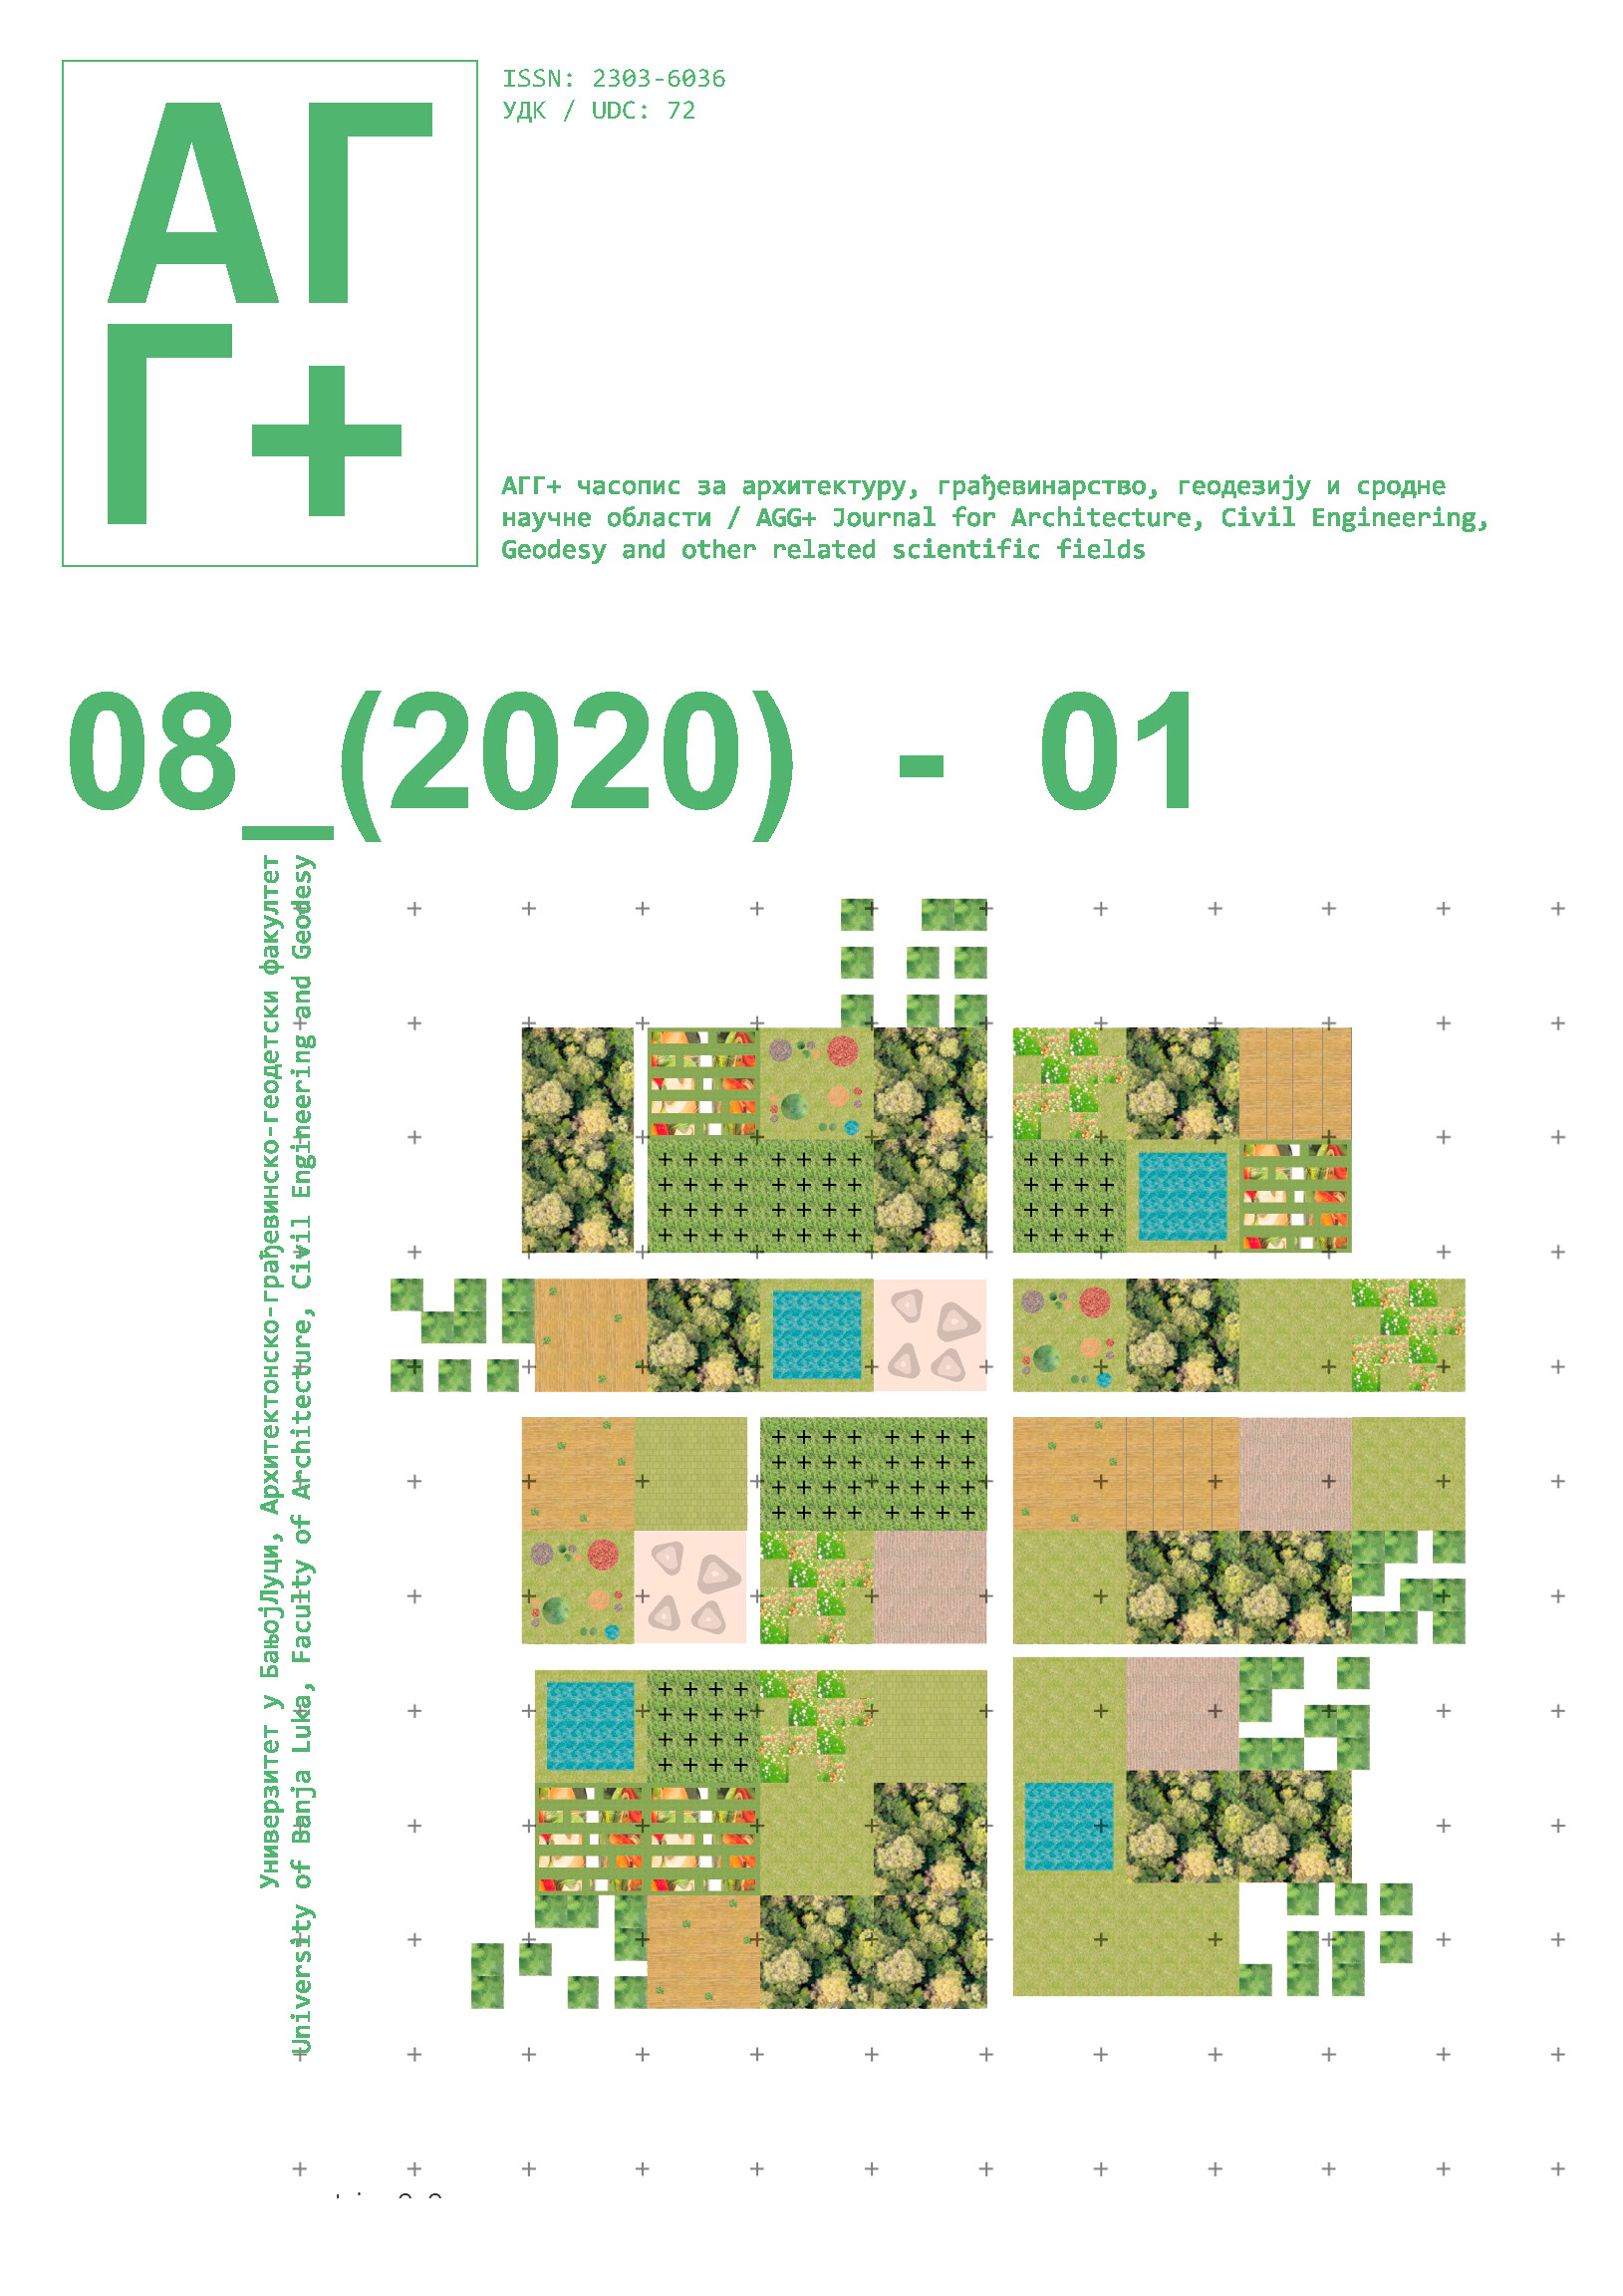 View No. 8 (2020): АГГ+